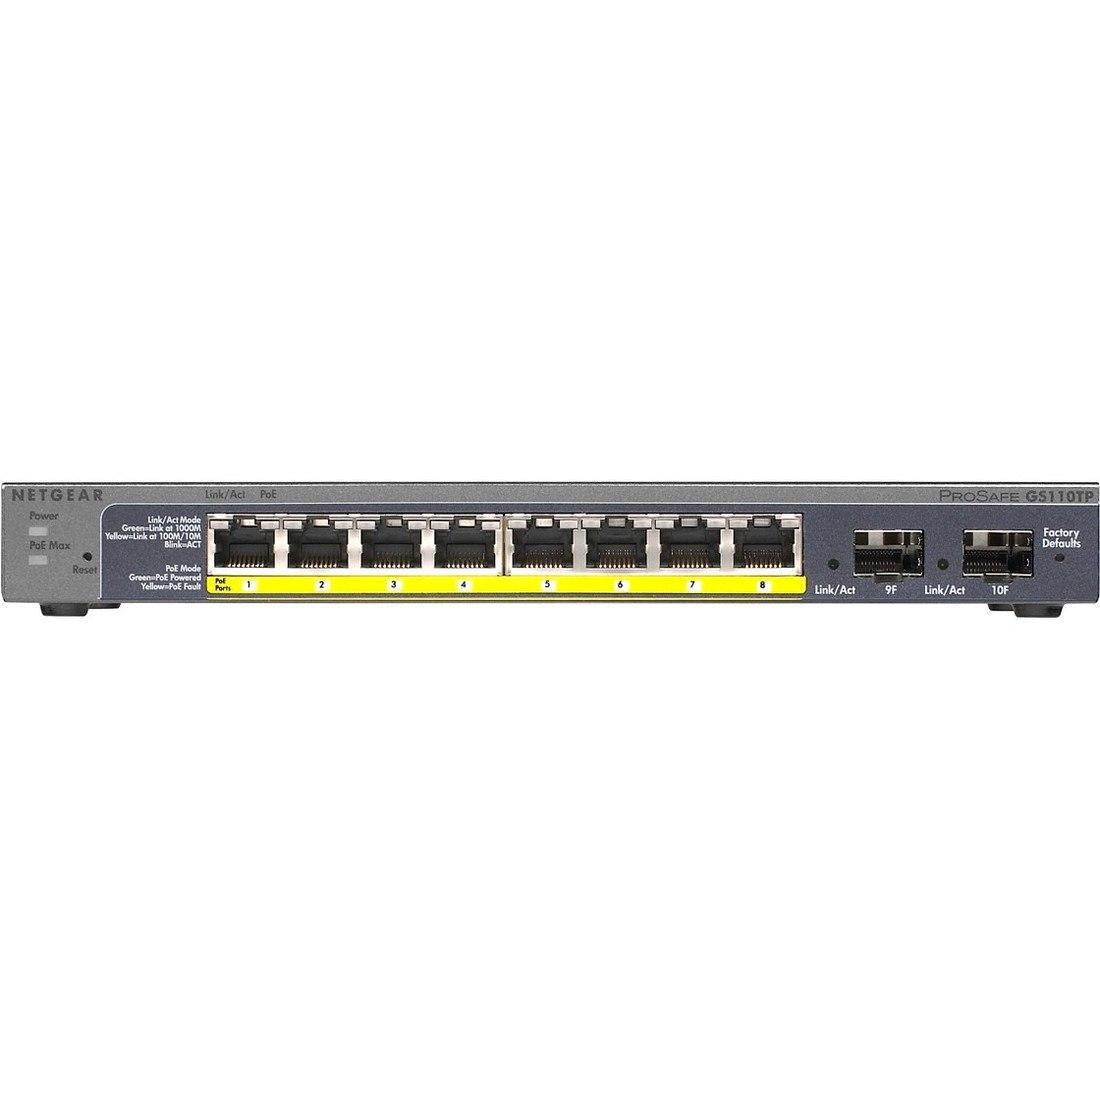 Netgear ProSafe GS110TP 8 Ports Manageable Ethernet Switch